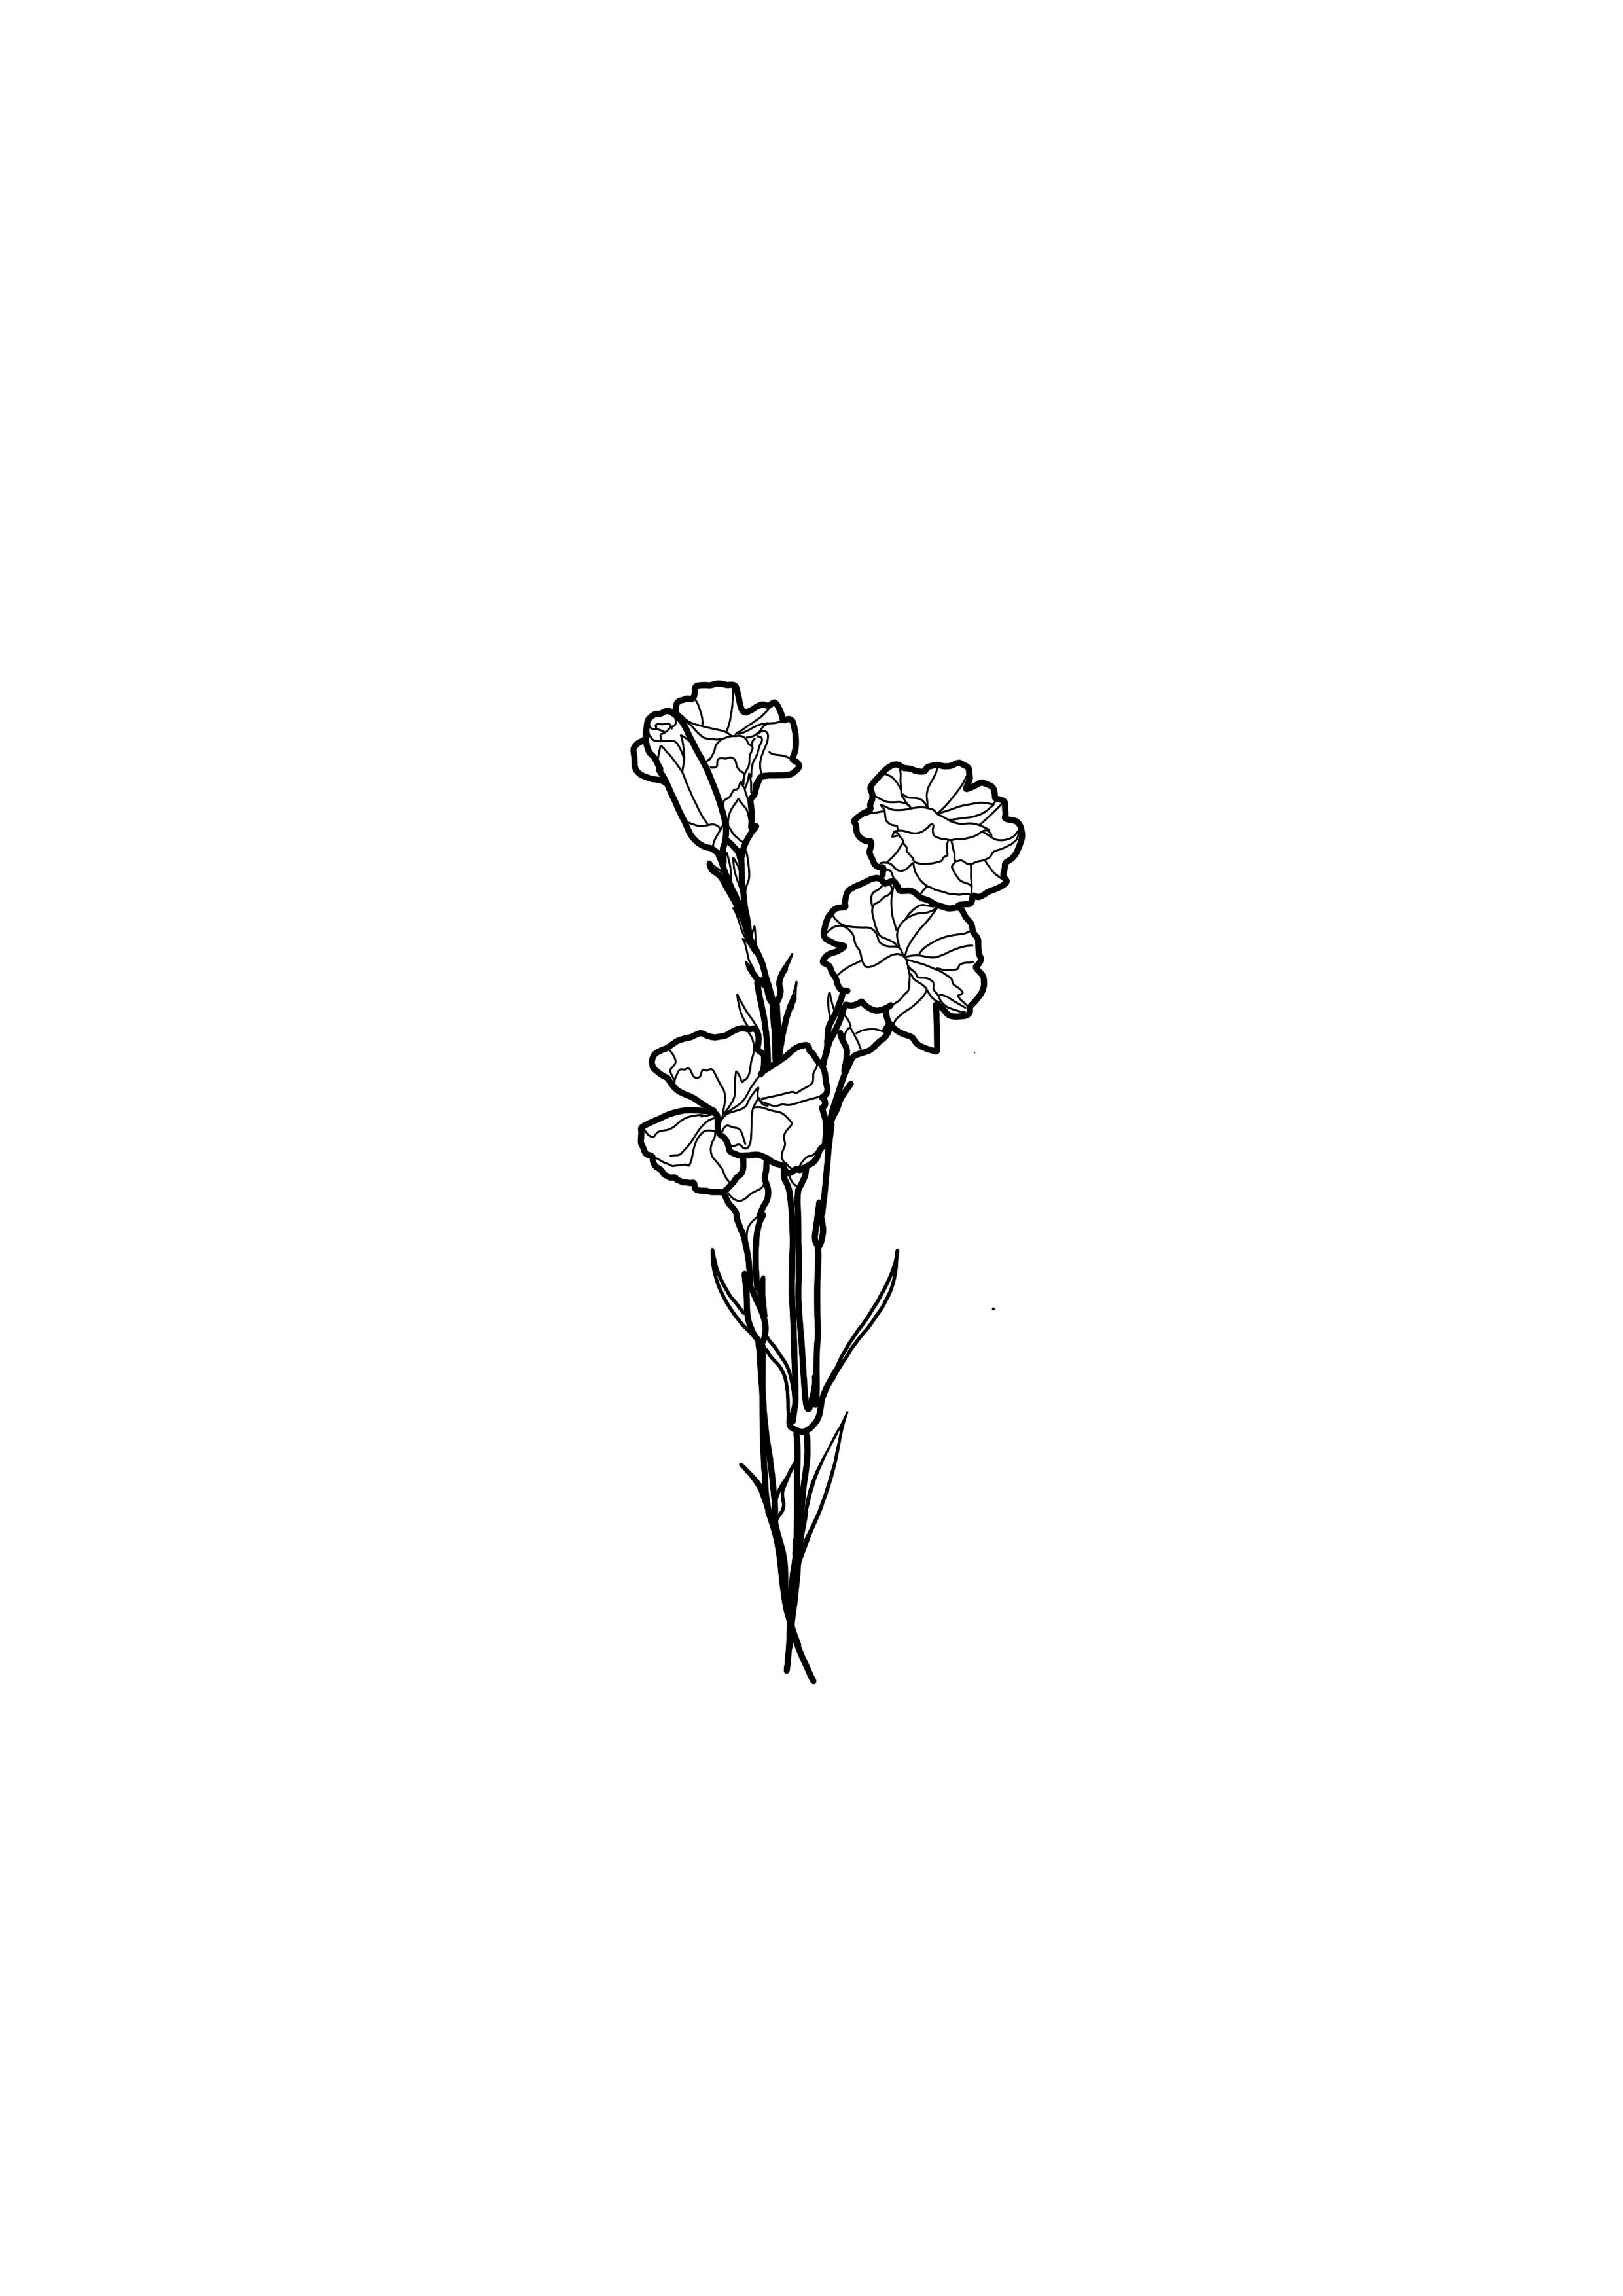 Simple Flower Tattoo Design Rose Tattoos Rose Tattoos For Men Simple Flower Tattoo